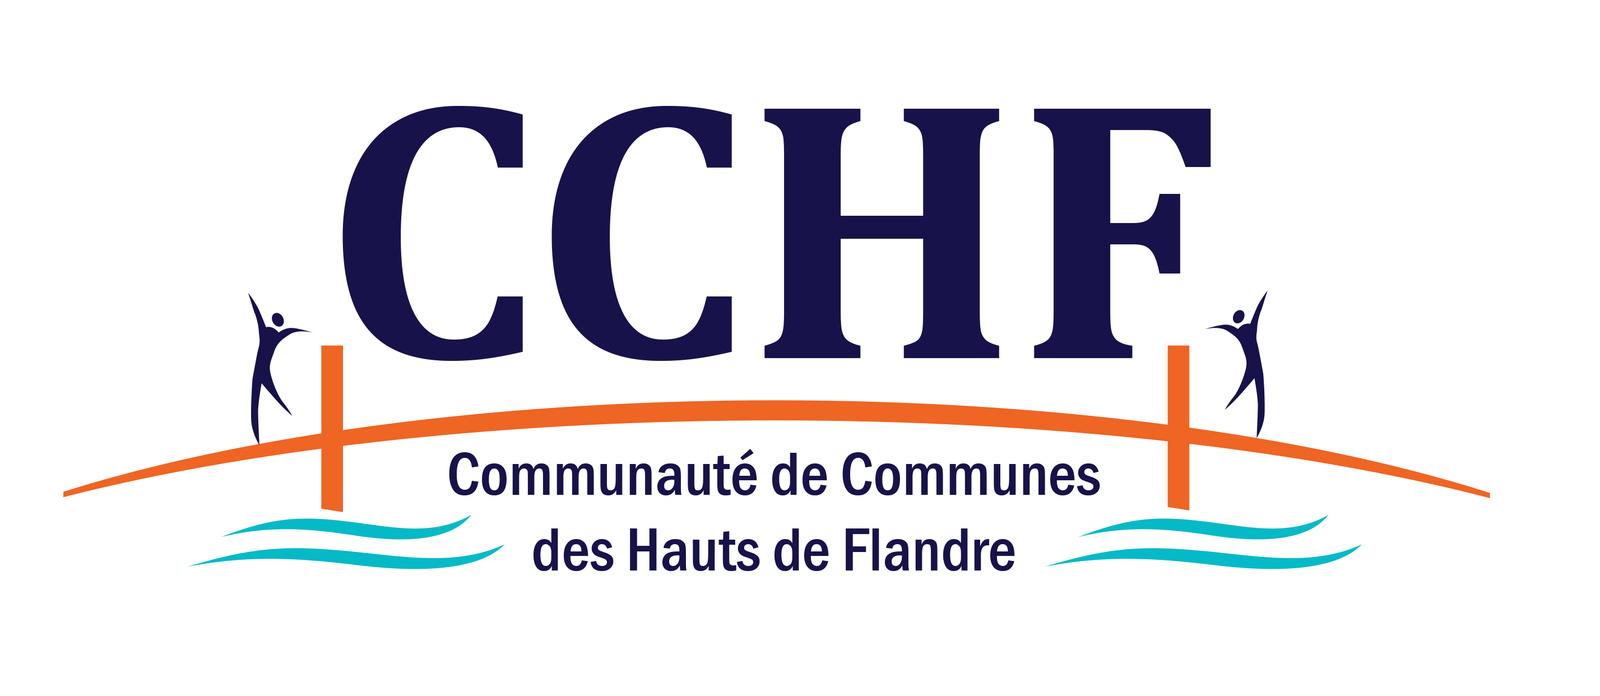 CCHF-logo.jpg